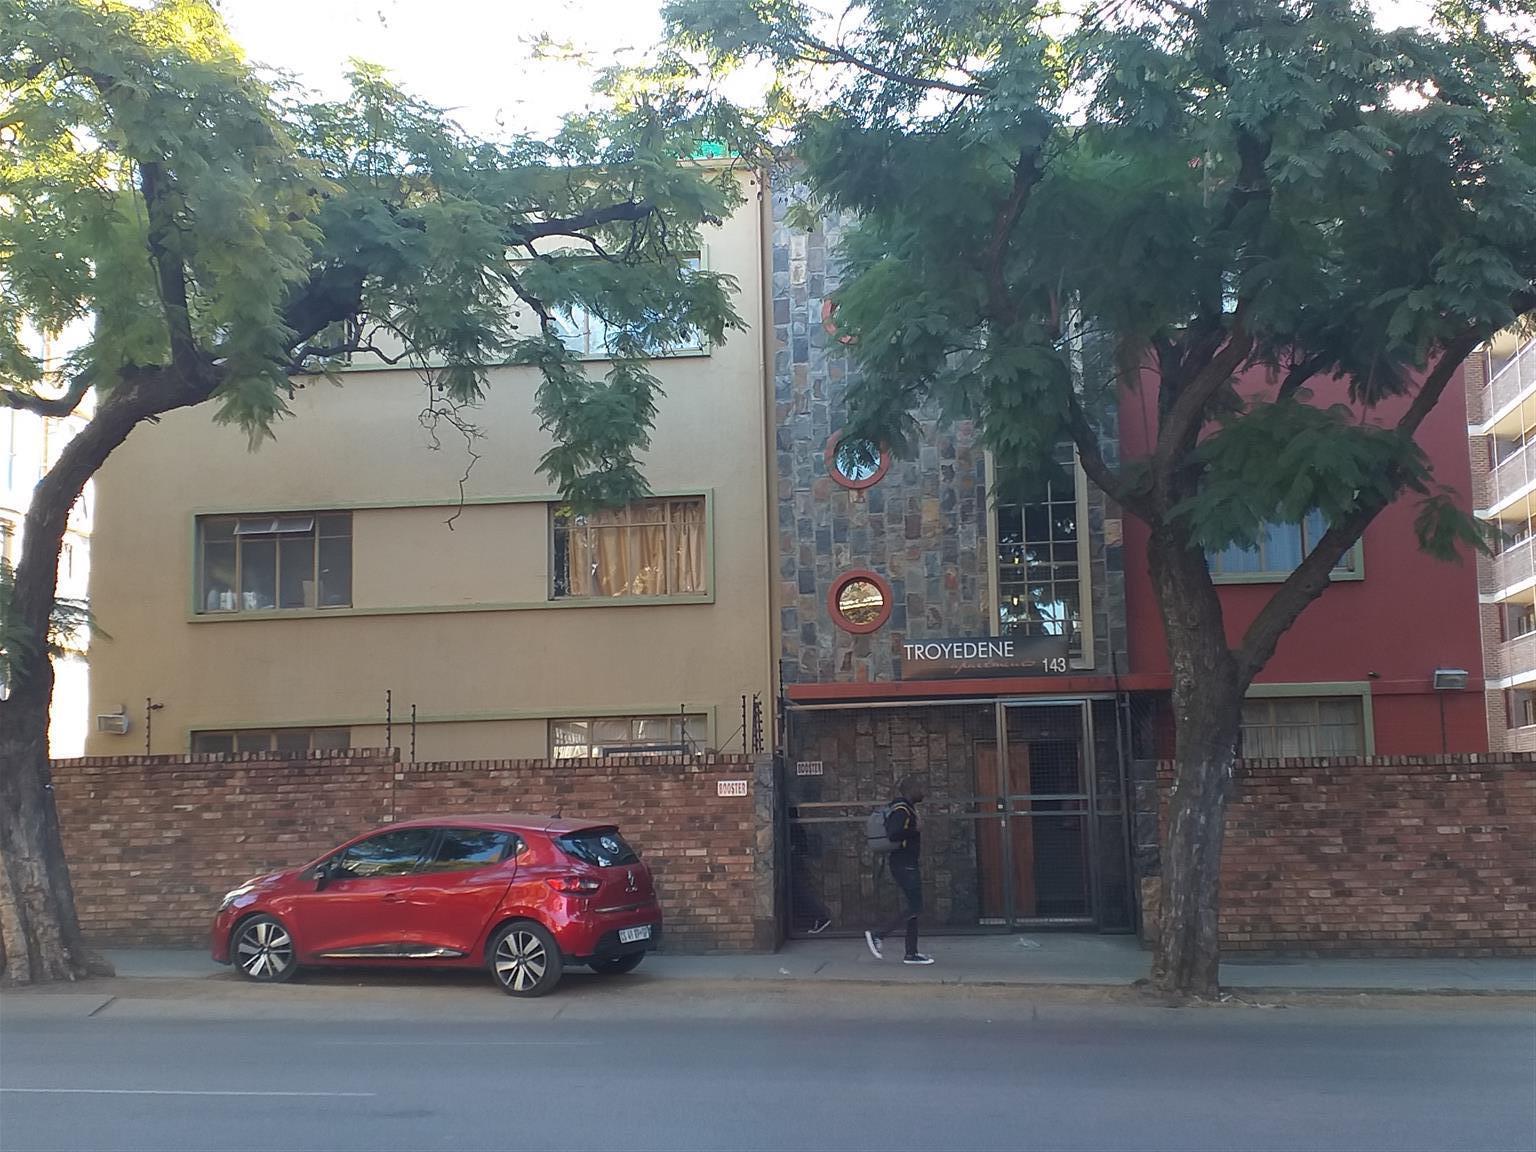 Bachelor flats Troydene - 143 Troye Street Sunnyside.